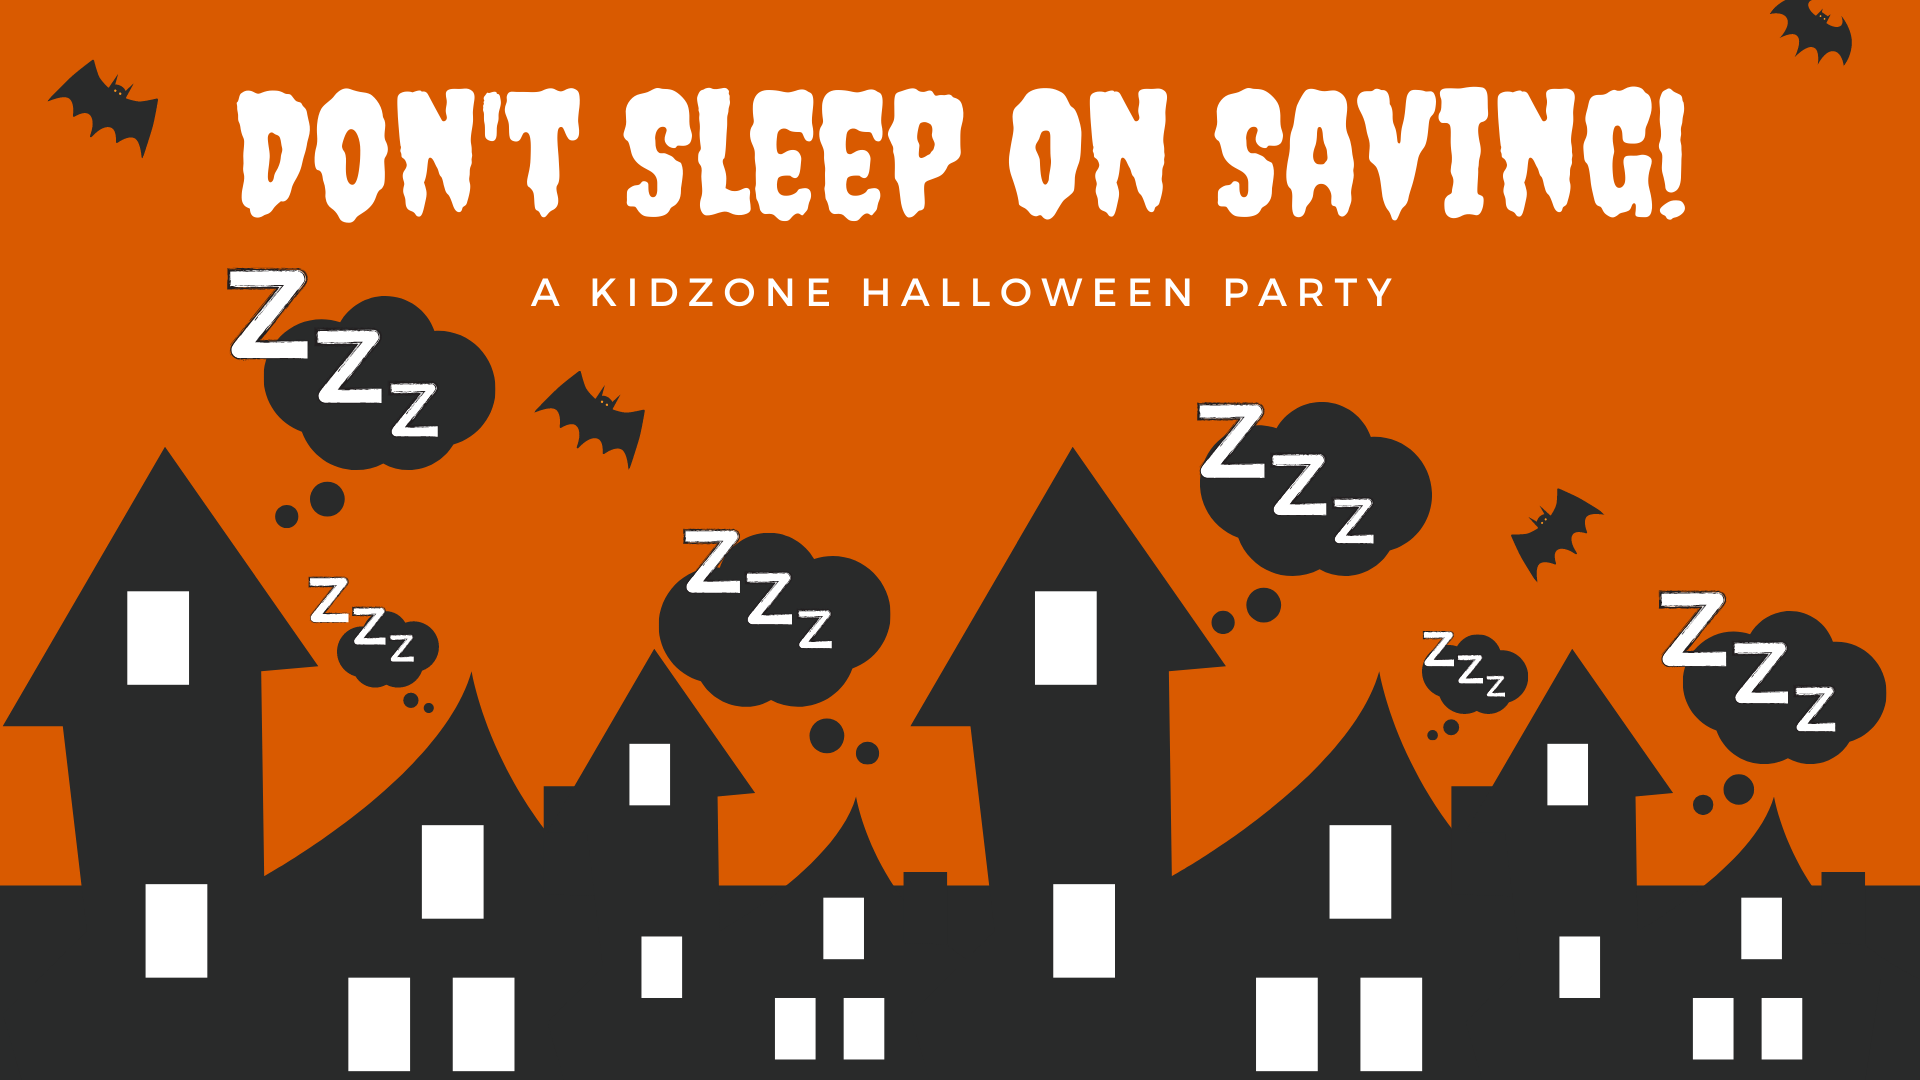 invitation to kidzone Halloween party